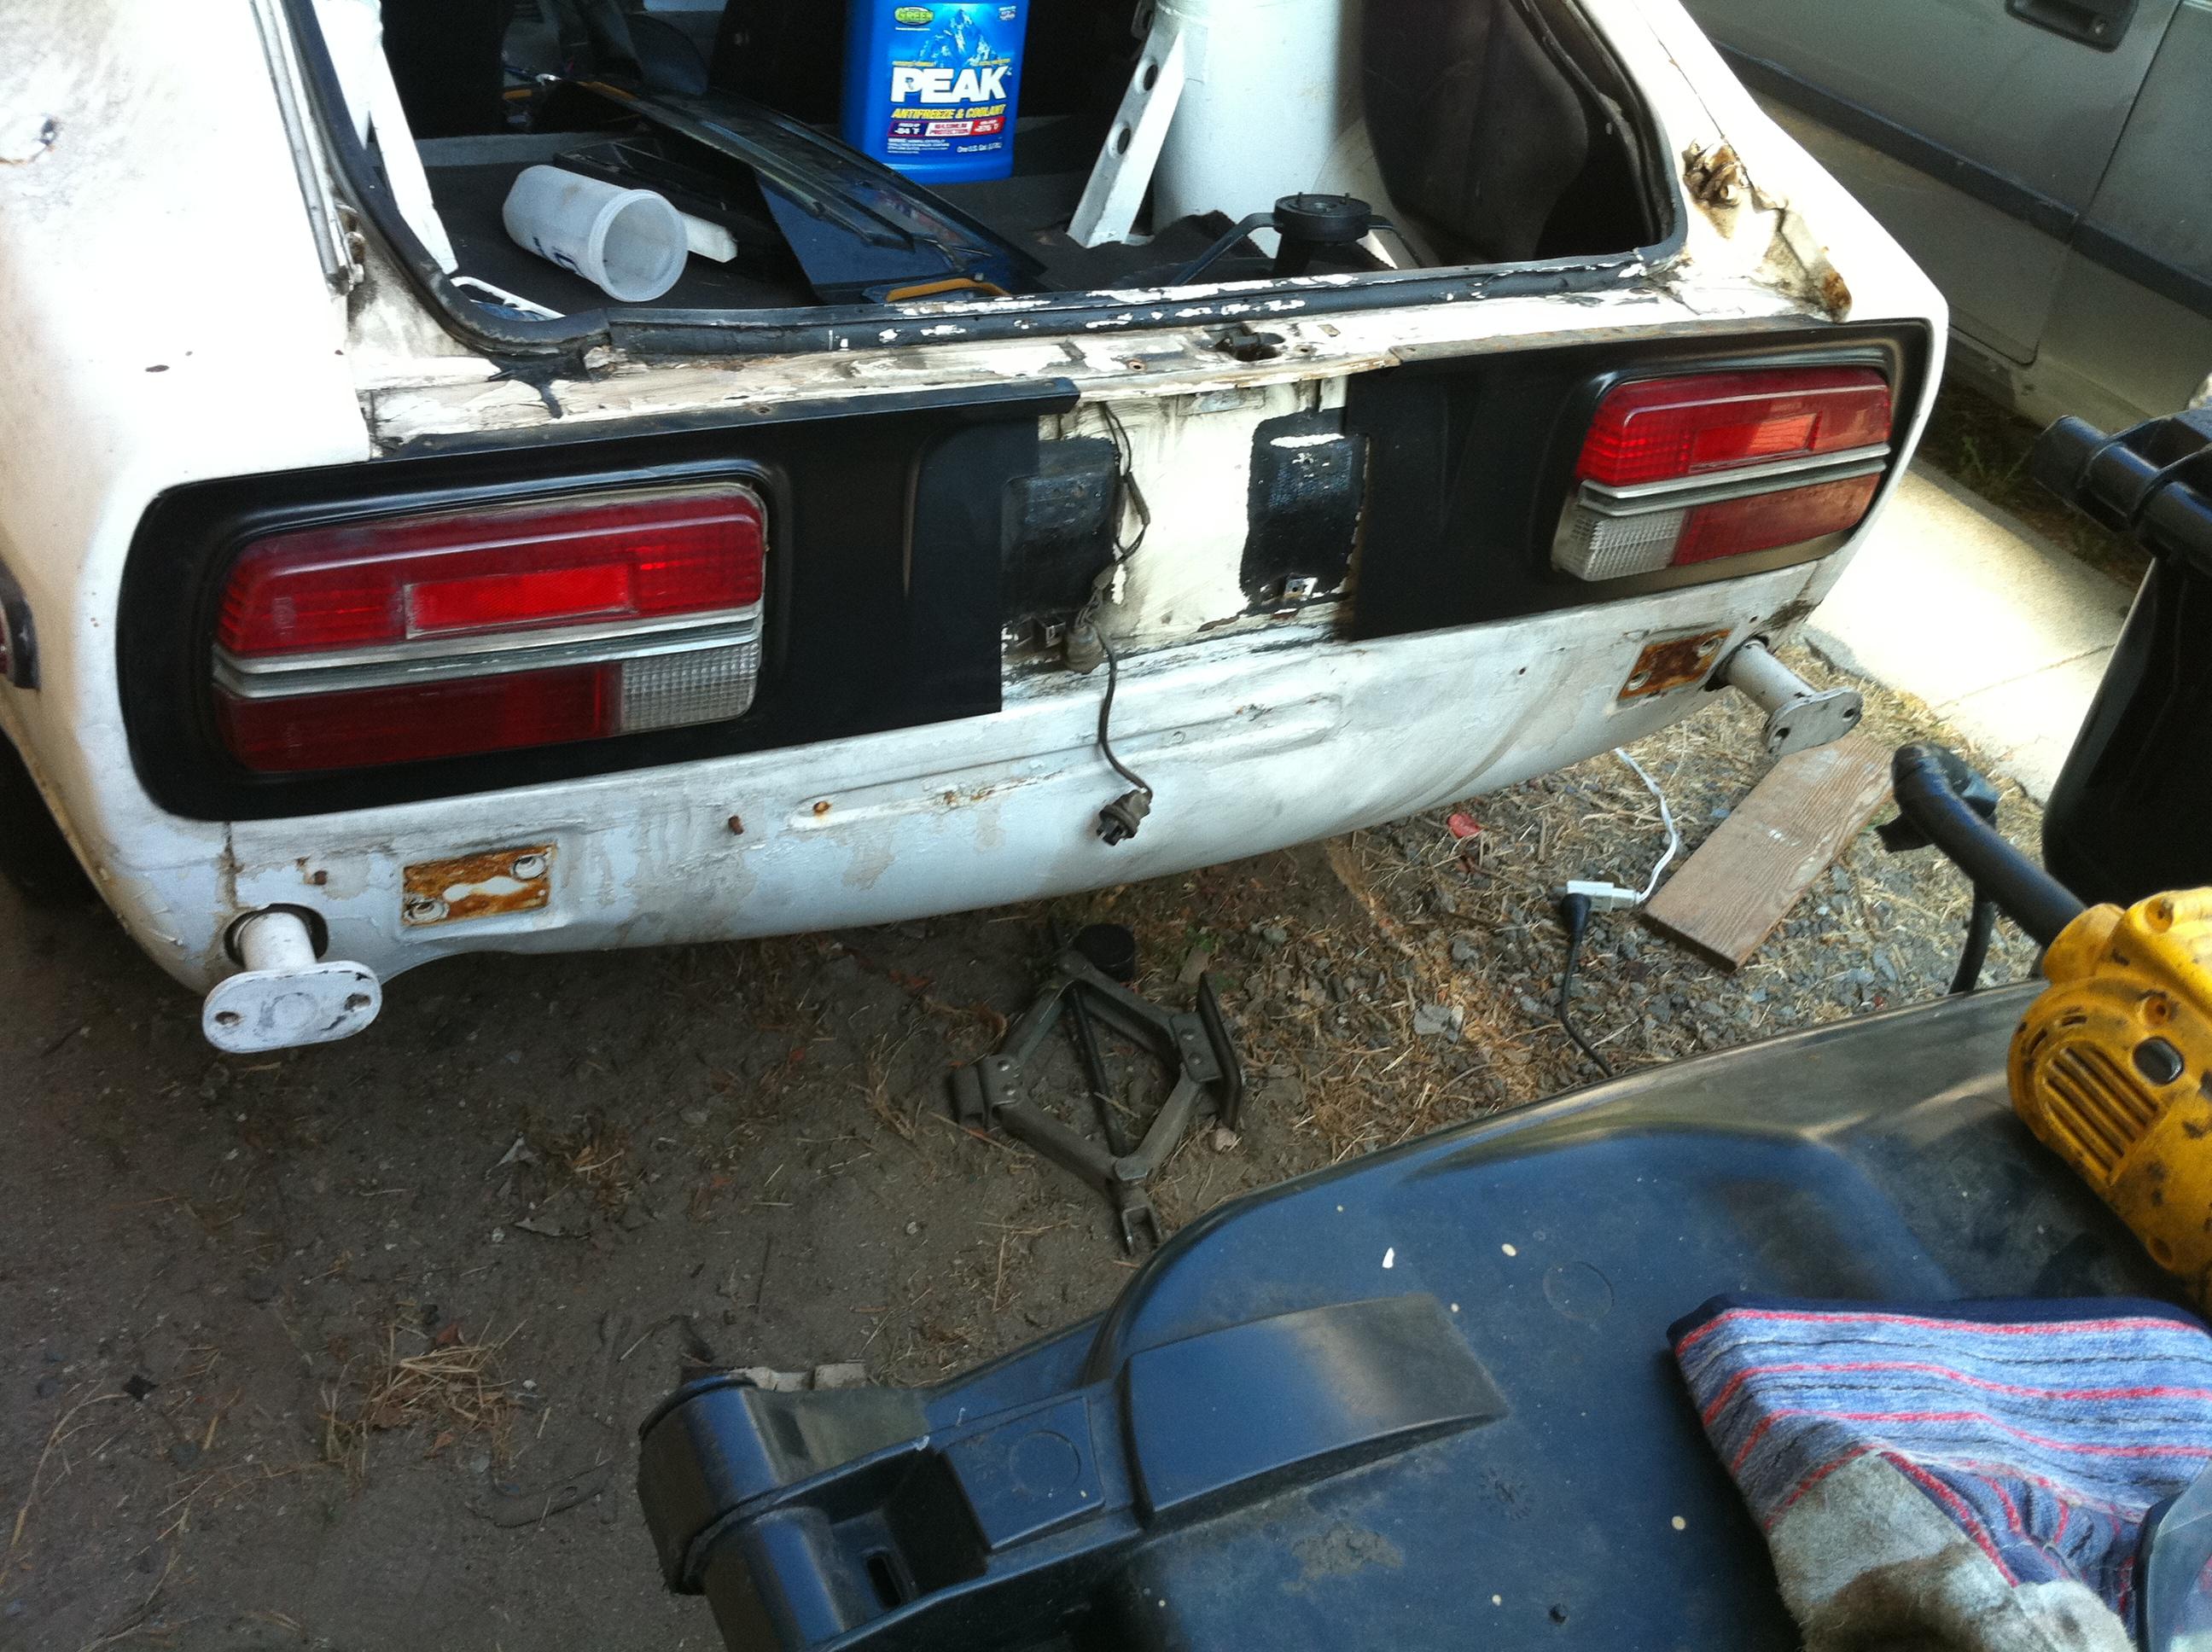 240z Tail Lights Into 260z 280z Write Up Pics Body Kits Paint Wiring Diagram Backup Post 10151 074281500 1286156689 Thumb